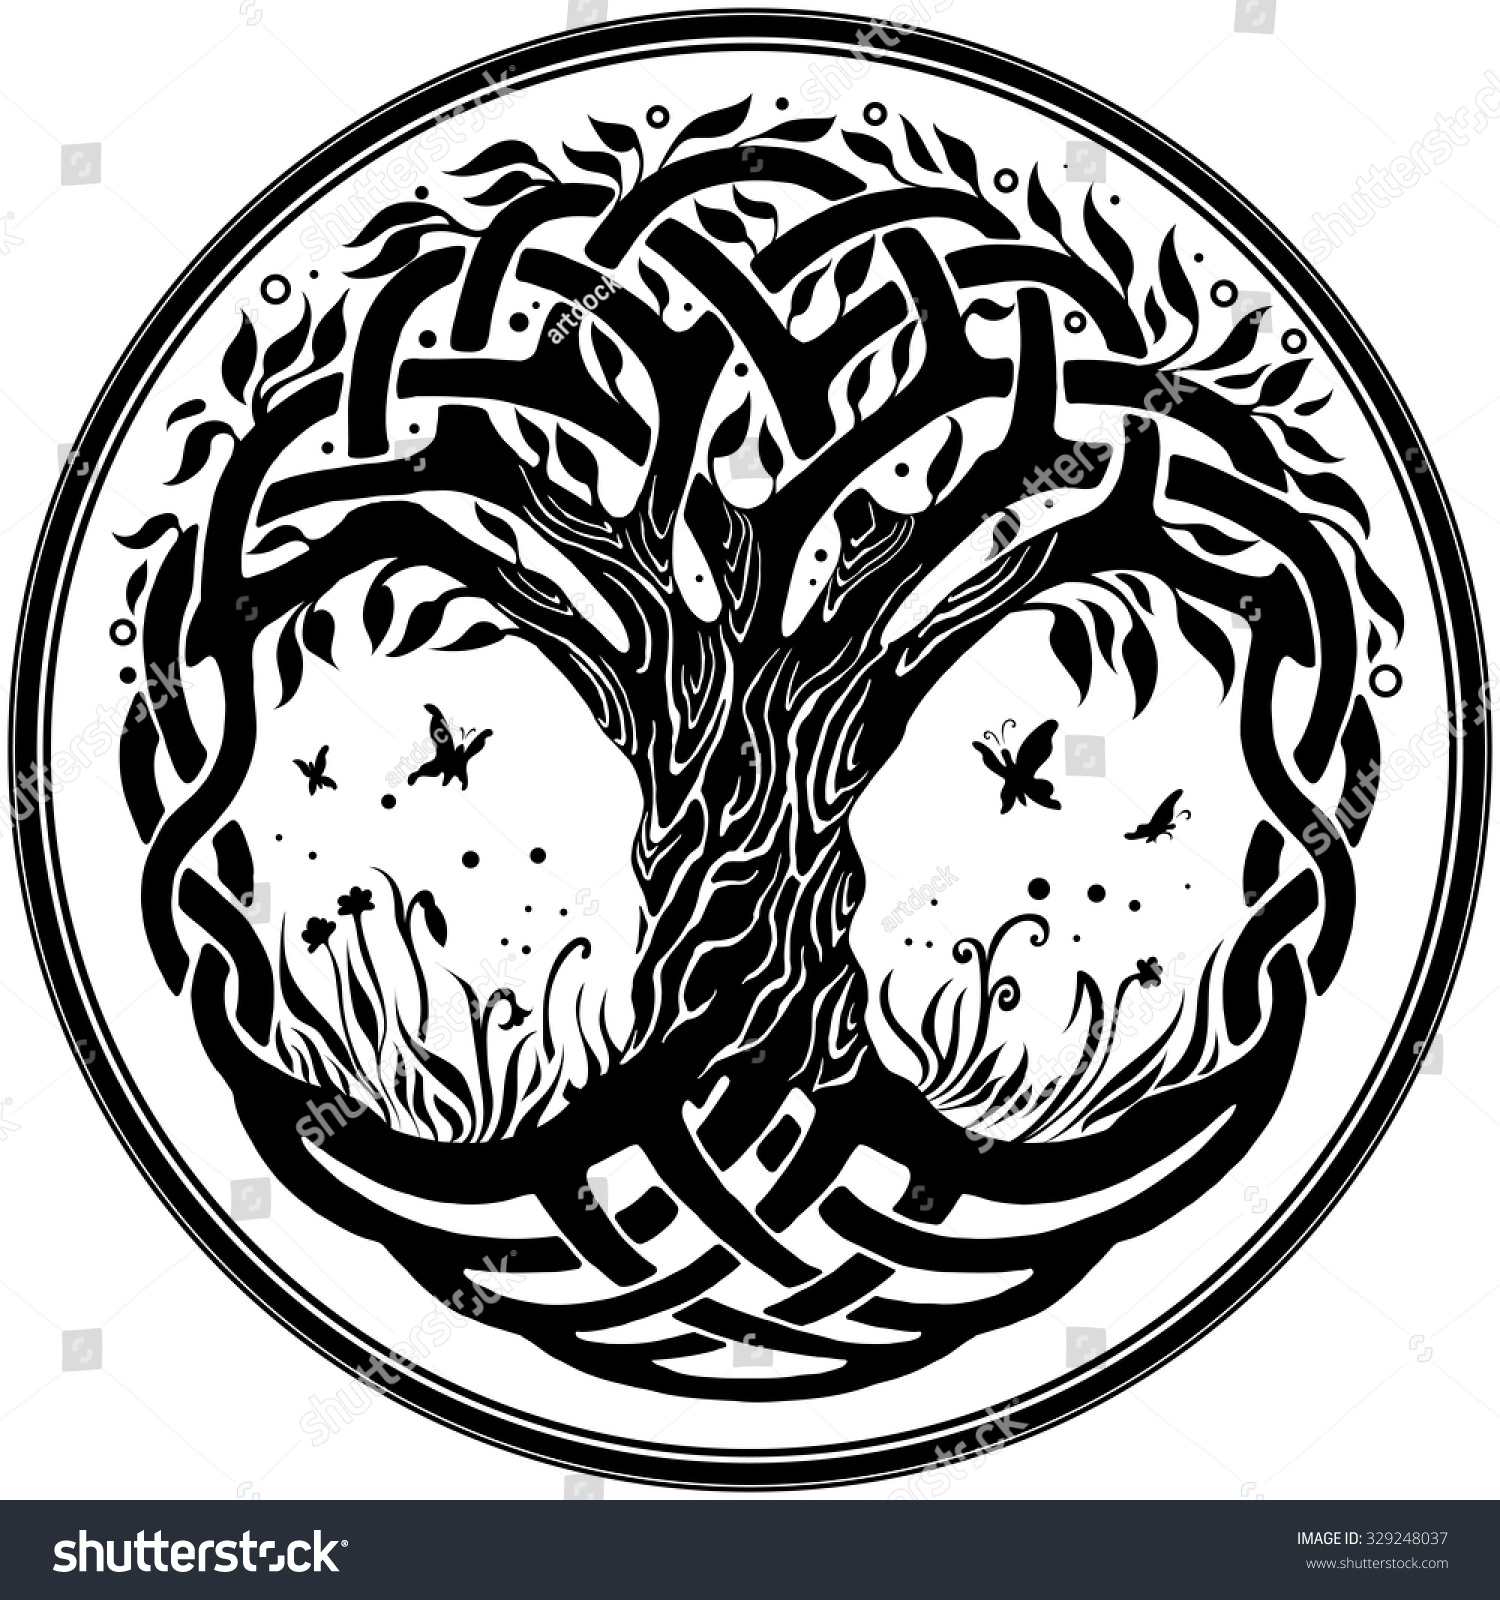 Tree of life ornament - Vector Ornament Decorative Round Celtic Tree Of Life